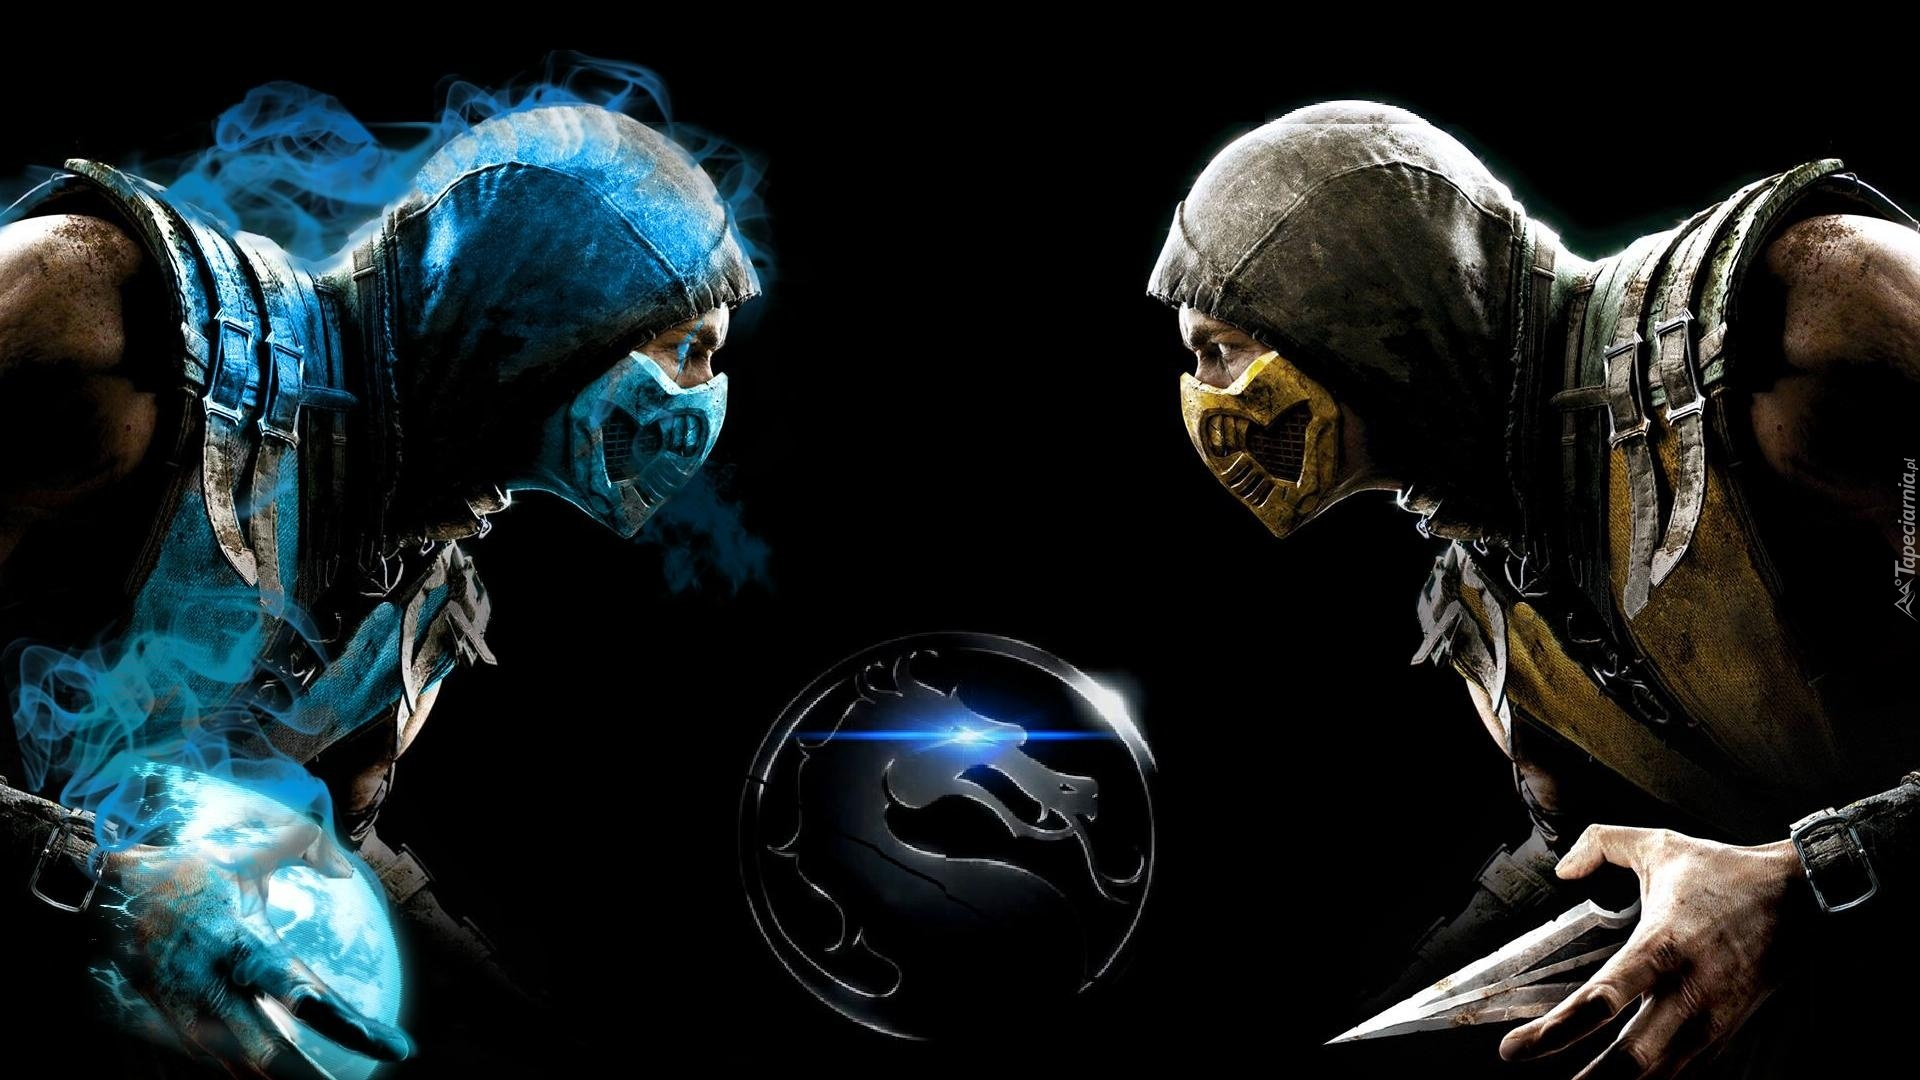 Mortal Kombat, Sub Zero, Scorpion